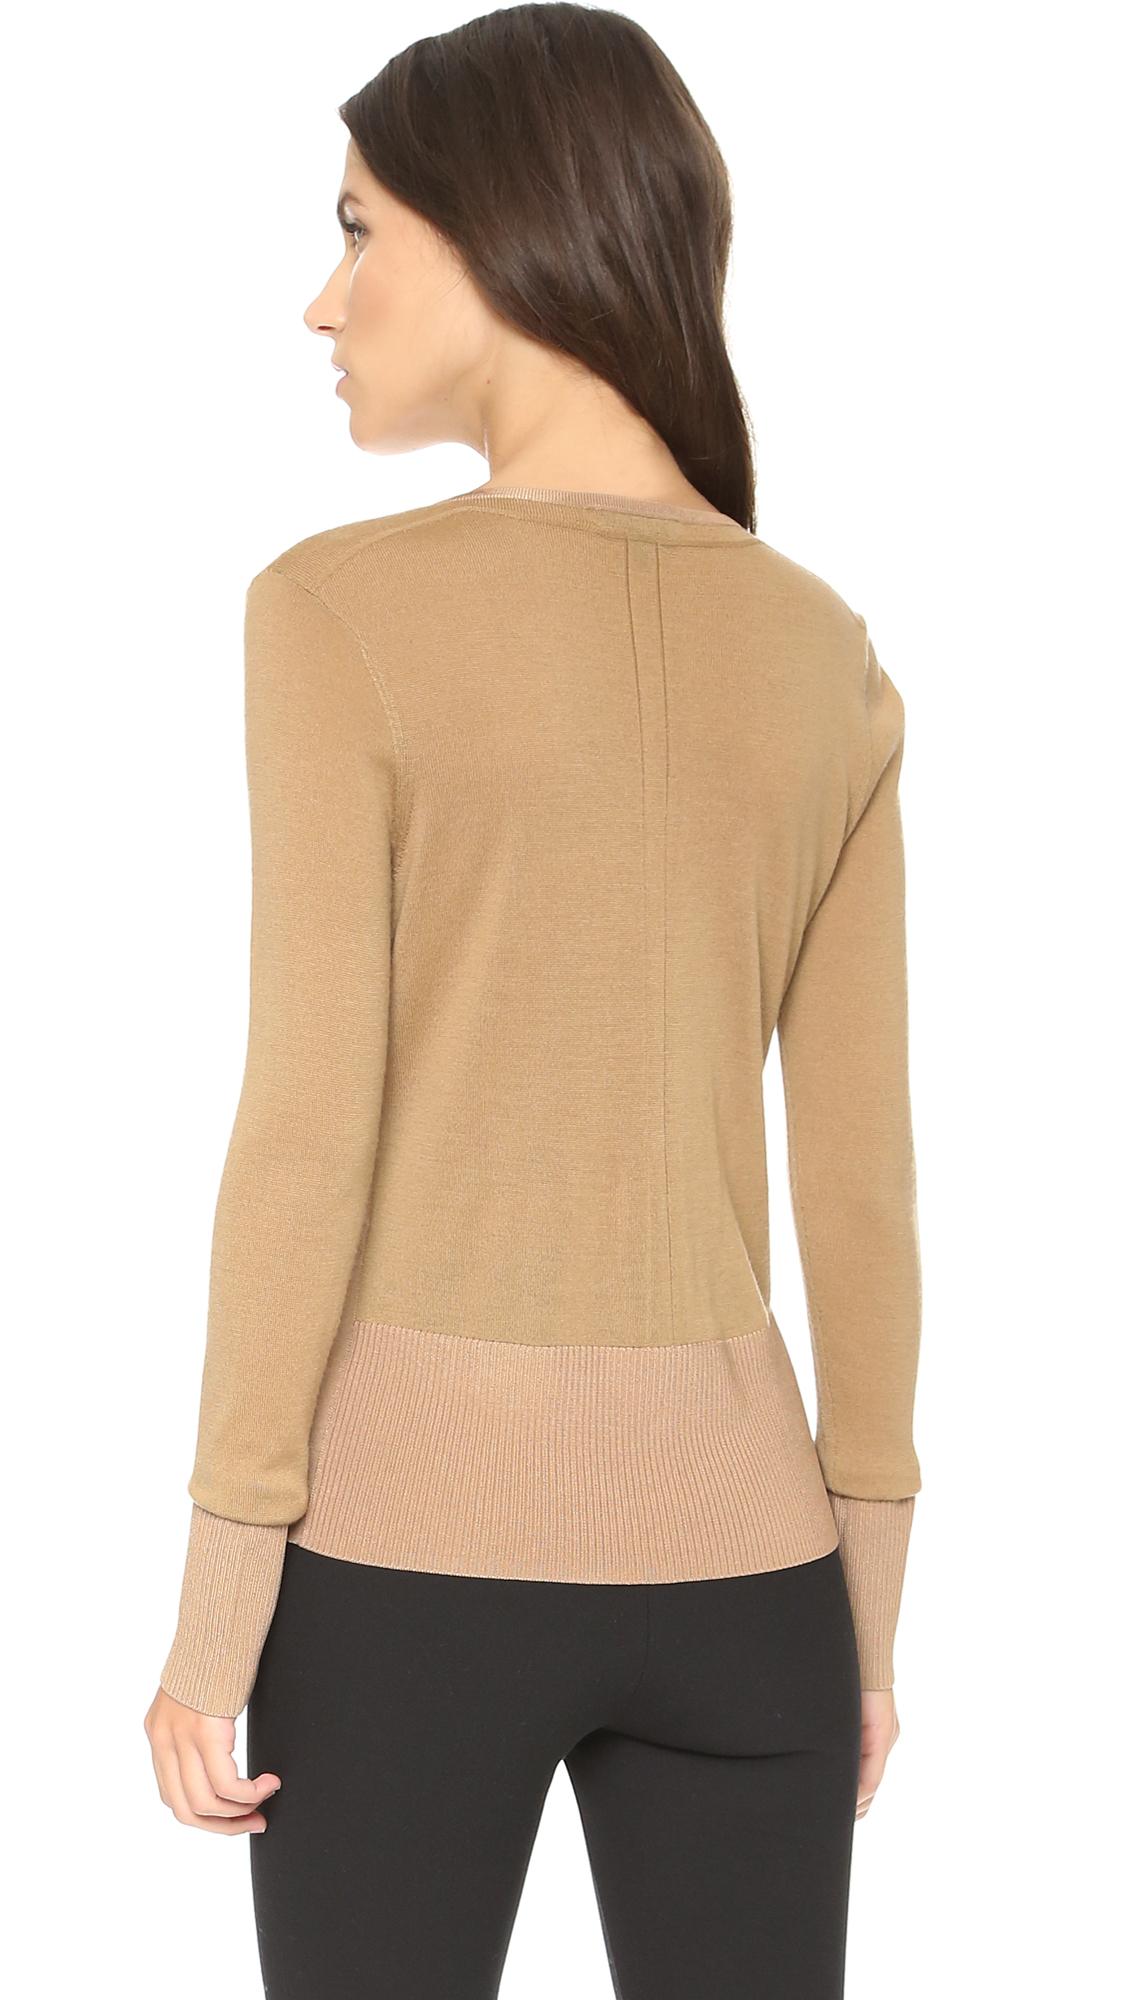 Cotton Cashmere Sweater Womens